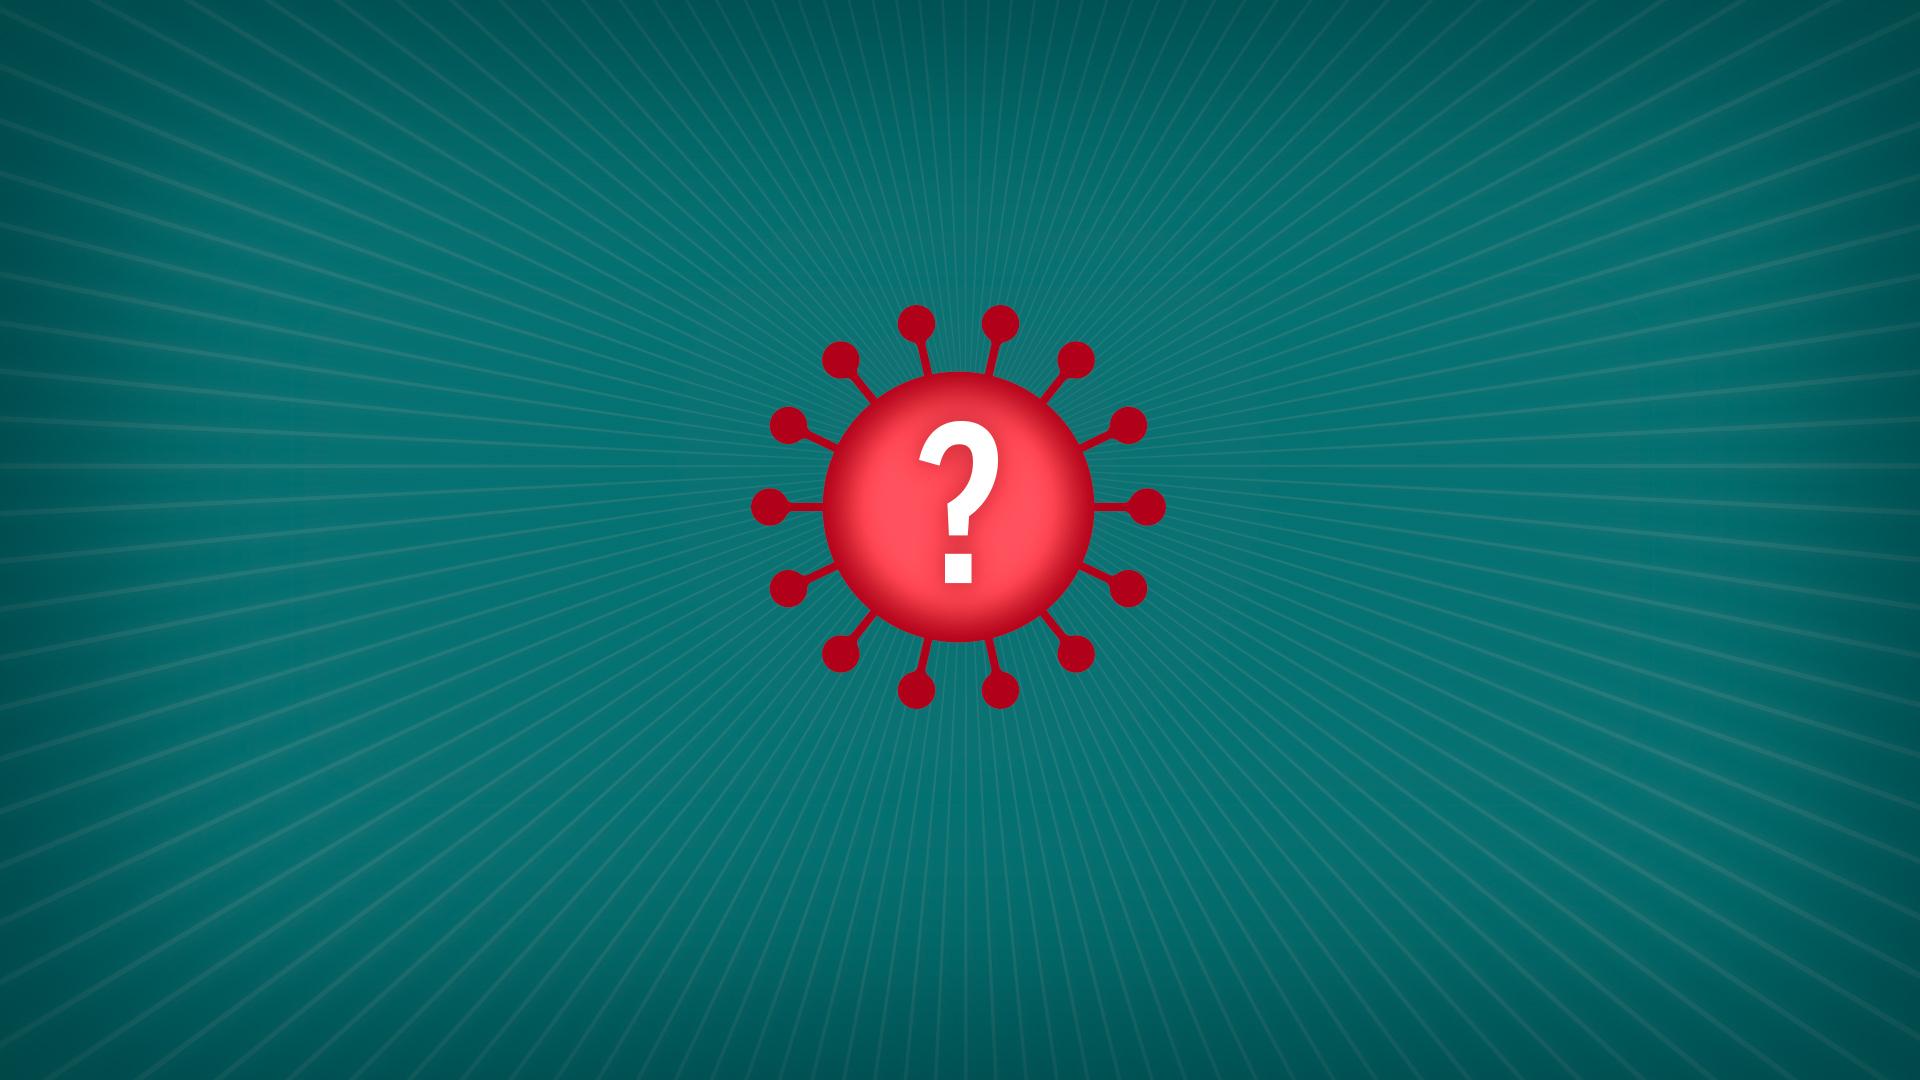 Virus Outbreak-Viral Question-Delta Variant